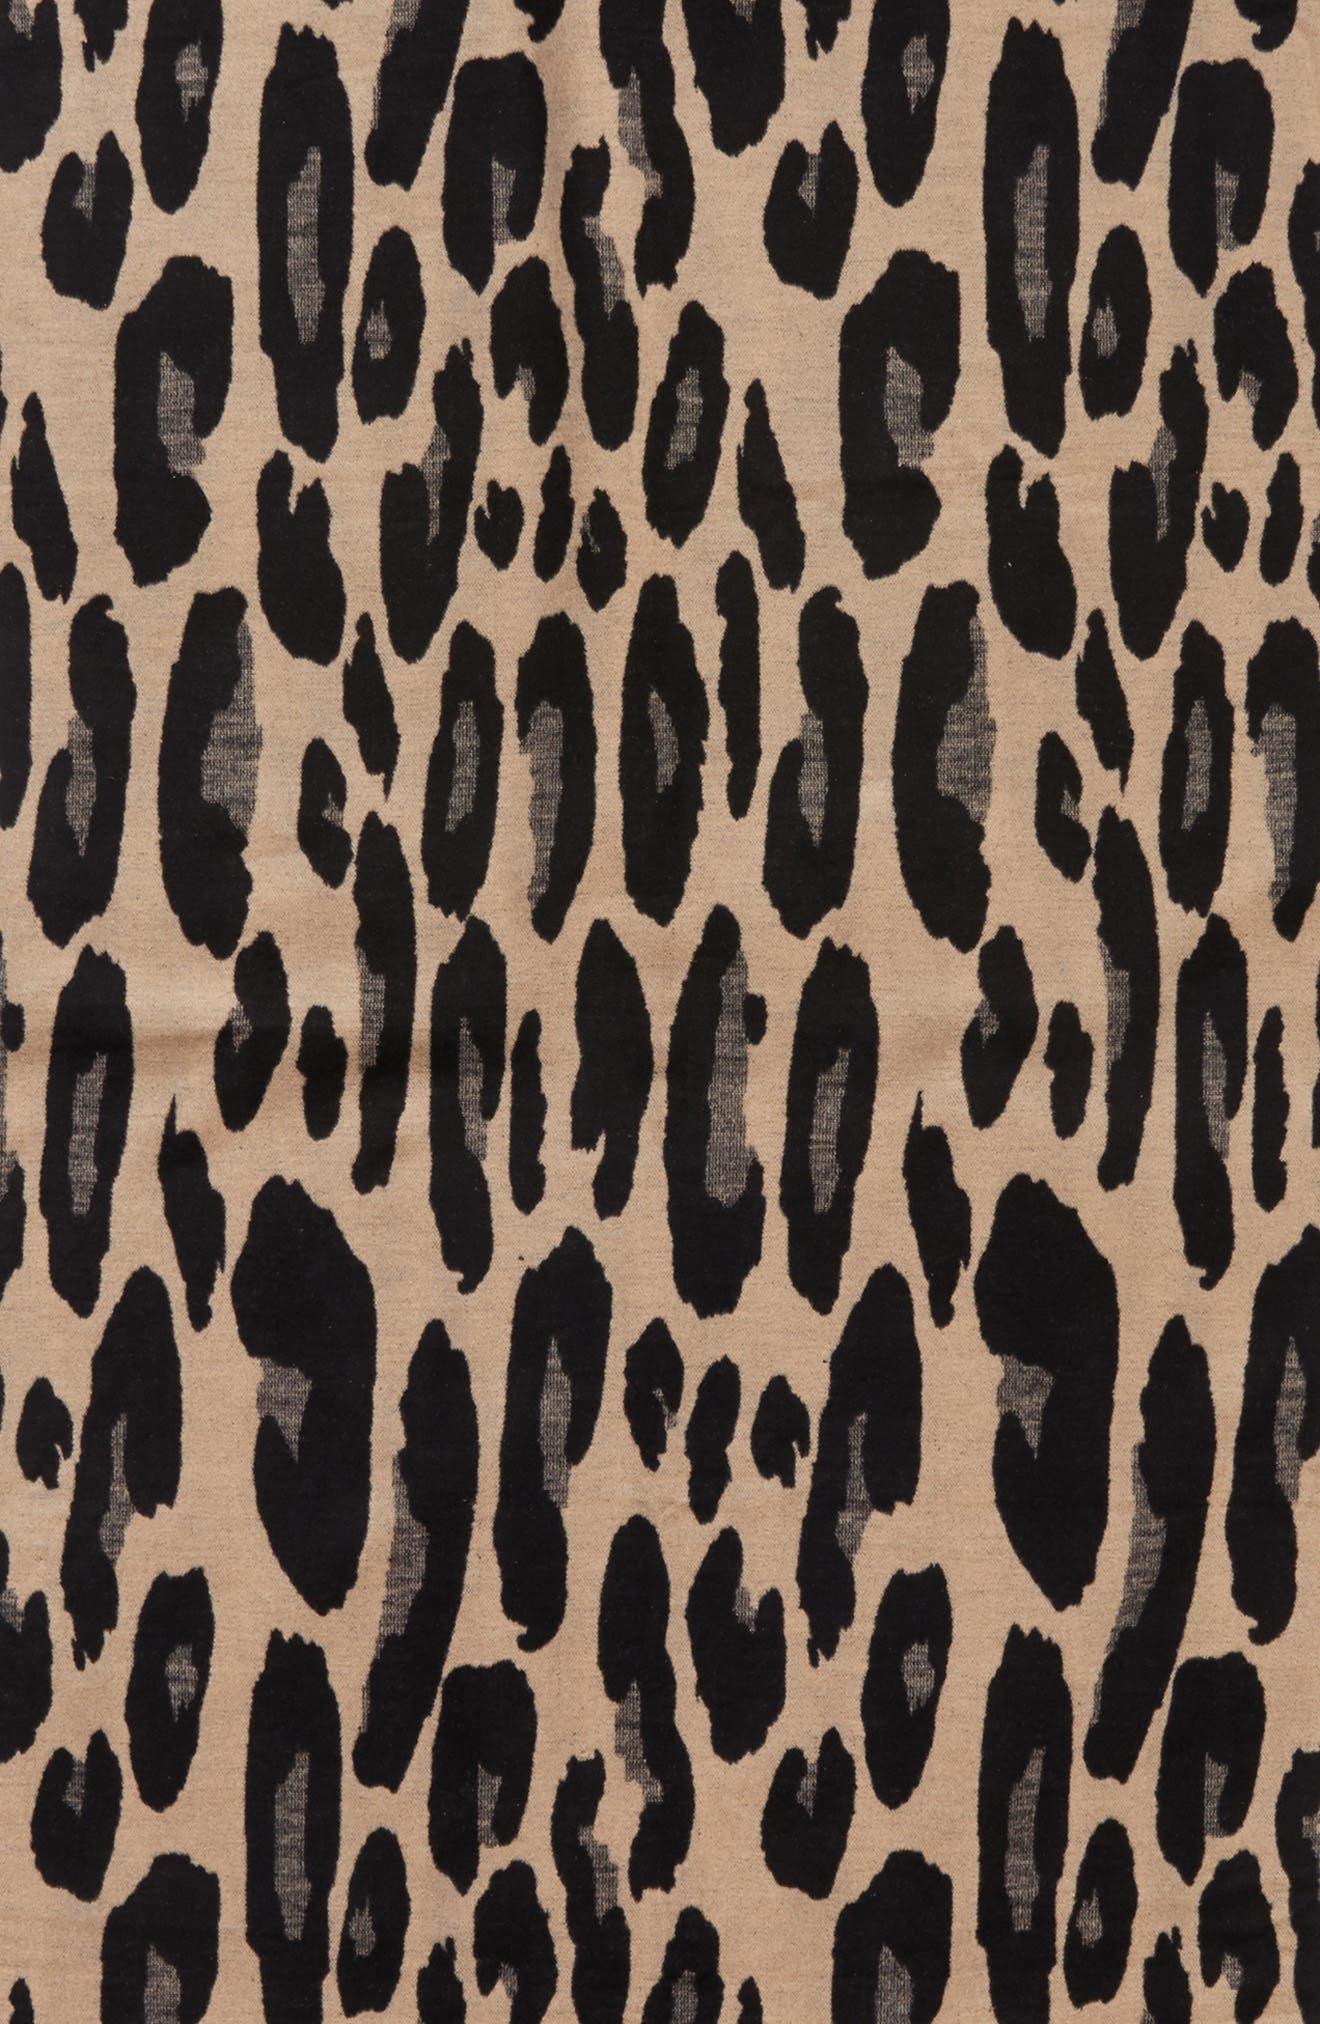 Leopard Print Brushed Silk Scarf,                             Alternate thumbnail 4, color,                             001